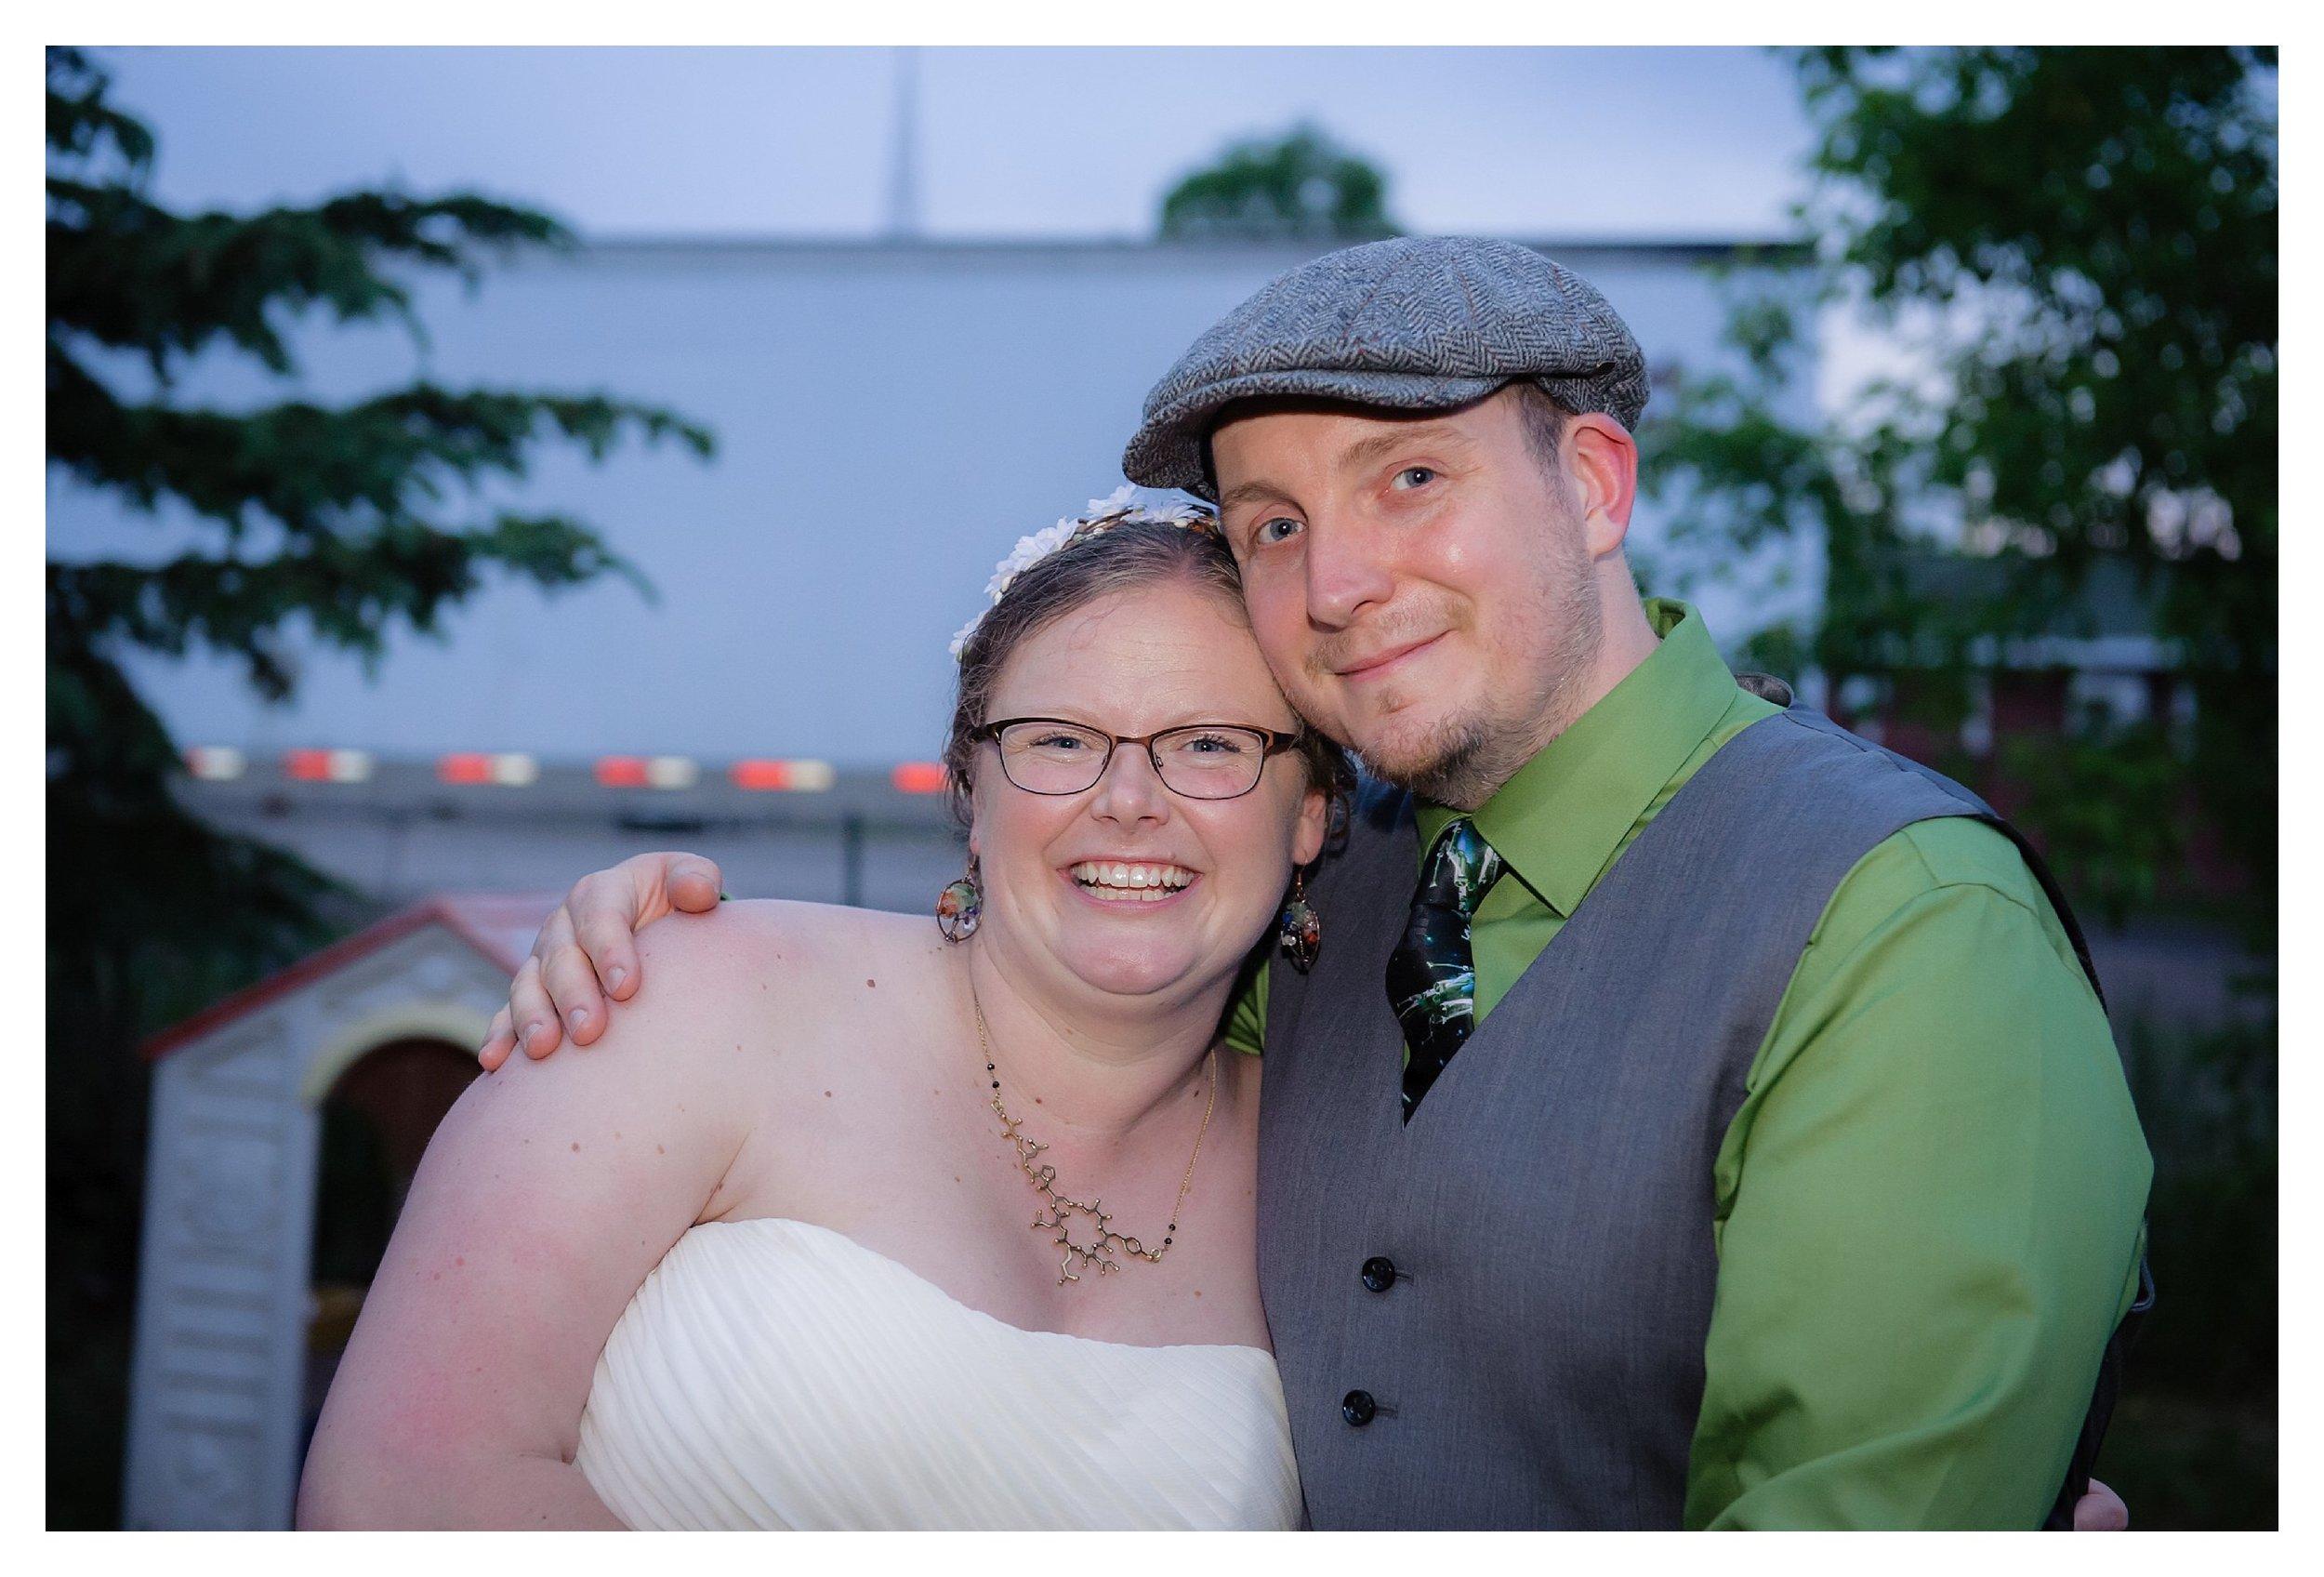 ashland oredock northwoods wisconsin wedding ps 139 photography_0304.jpg